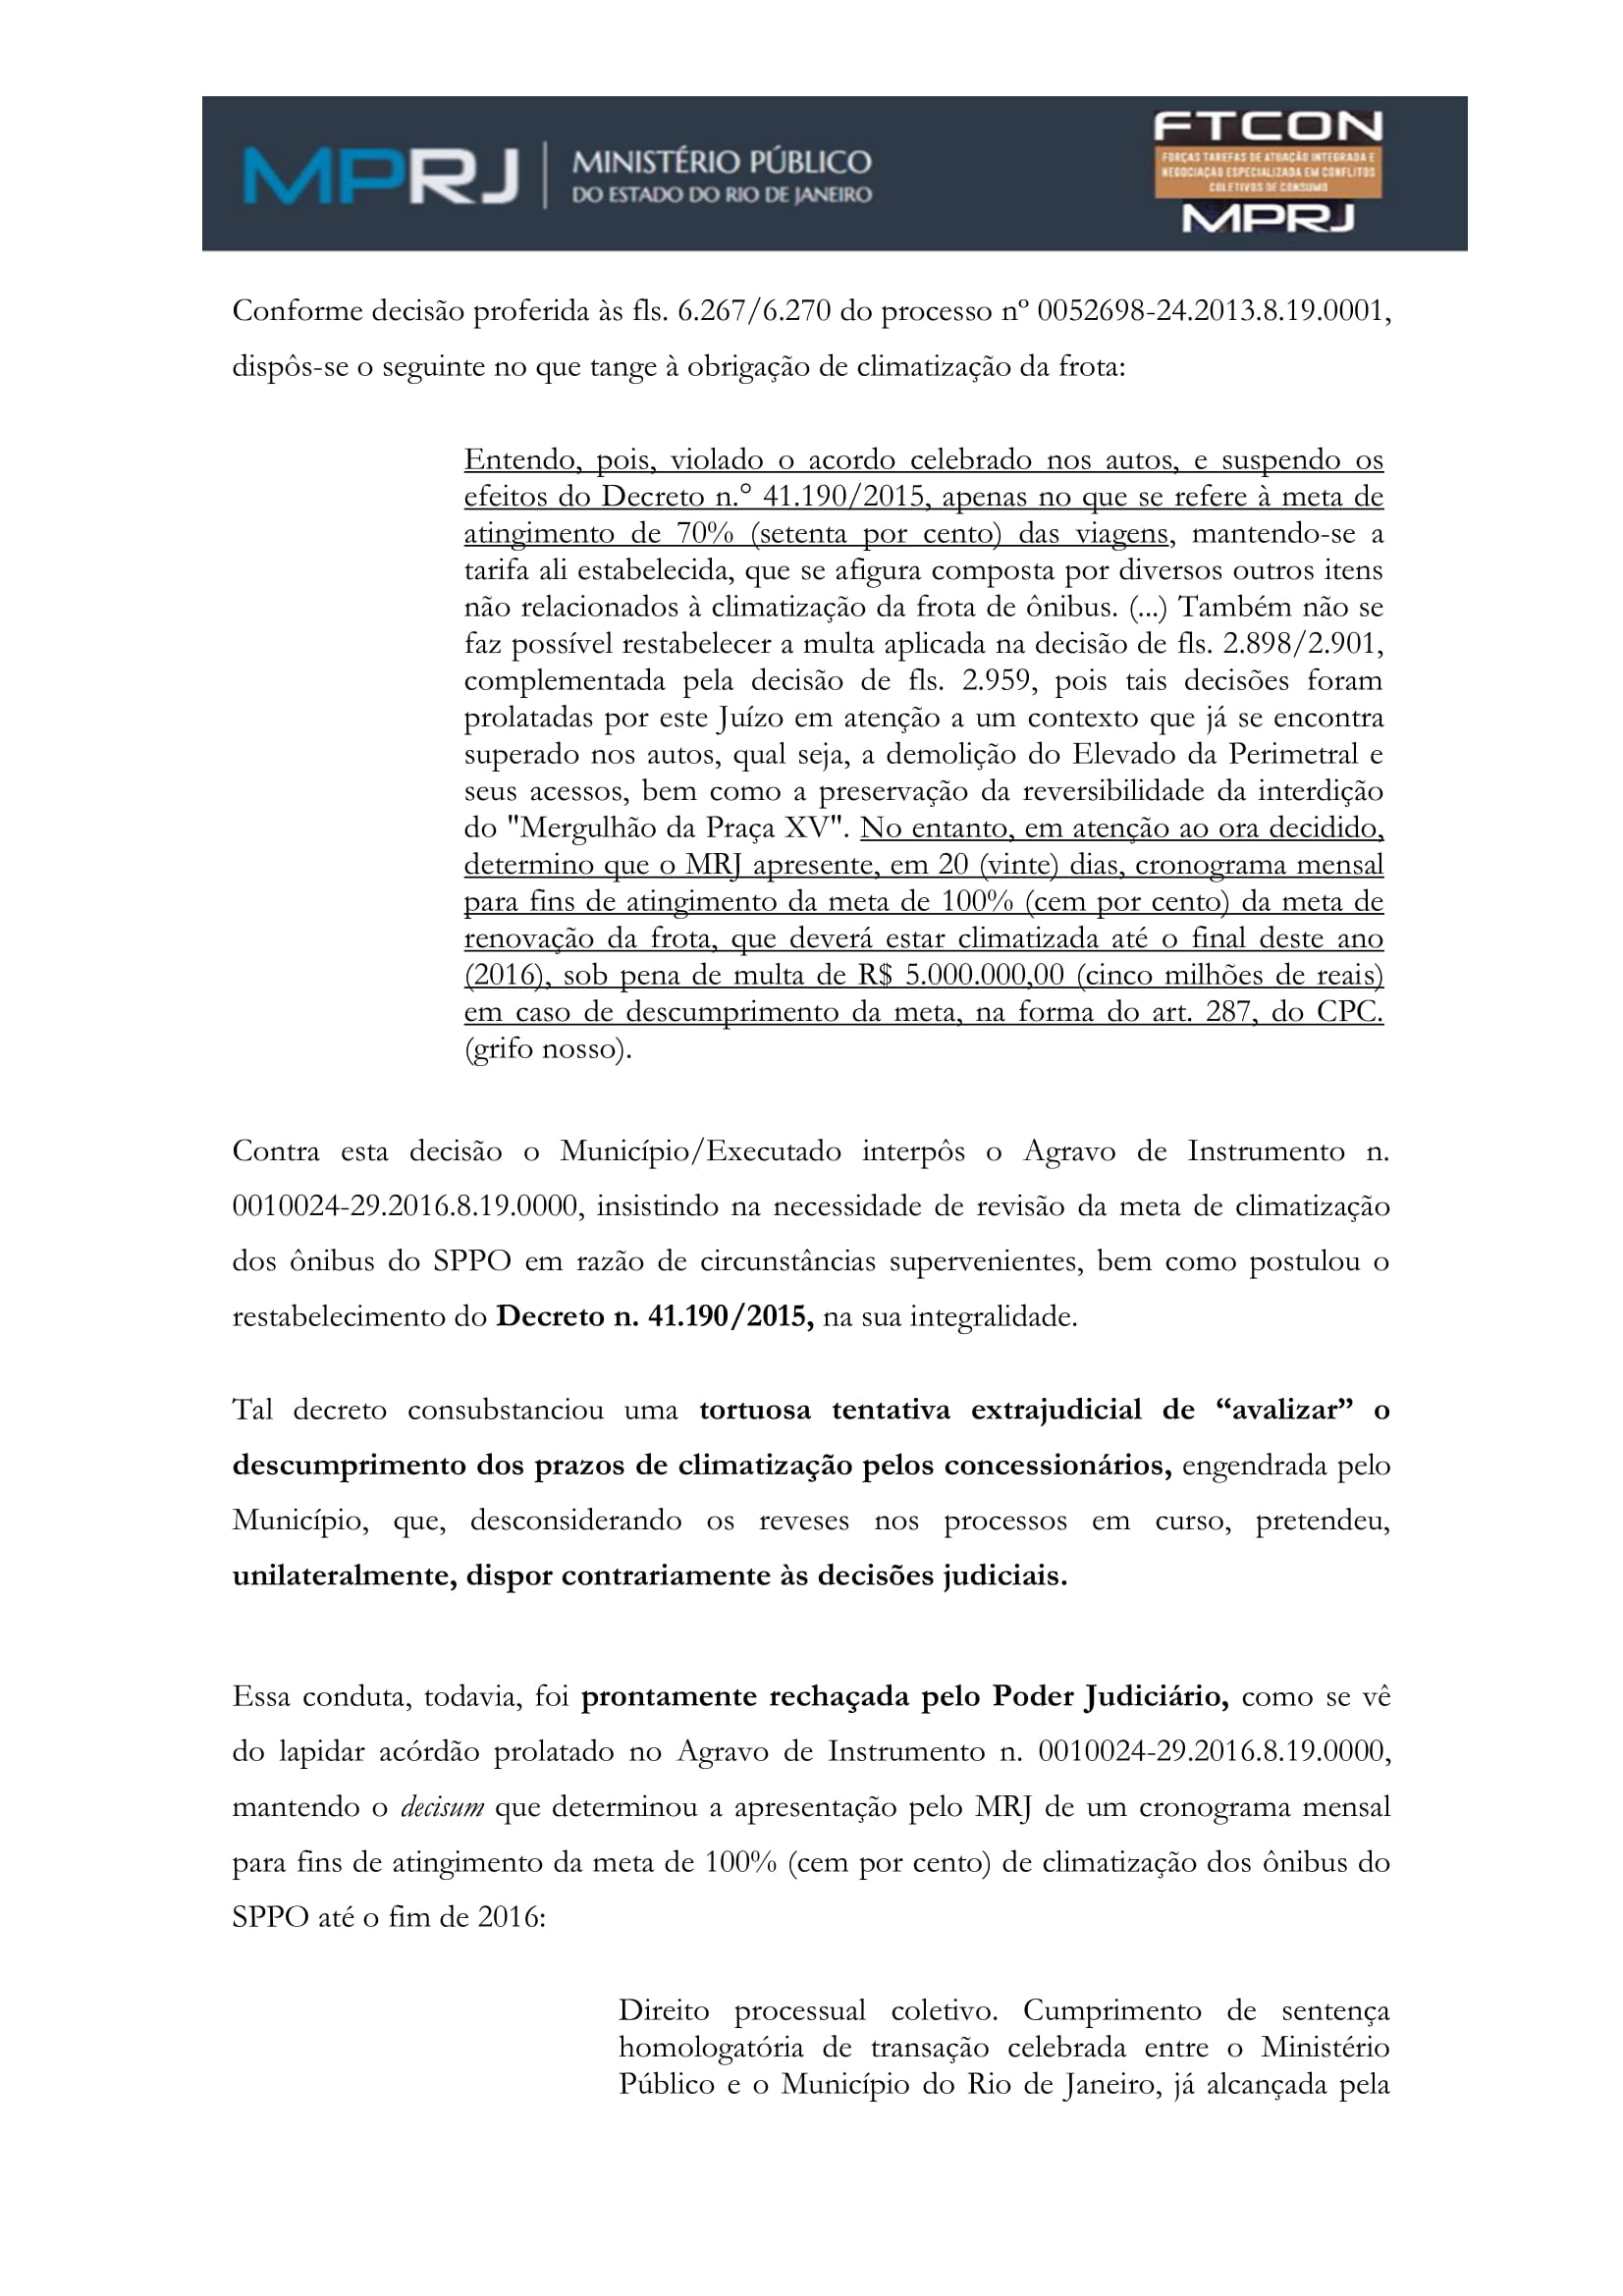 acp_caducidade_onibus_dr_rt-040